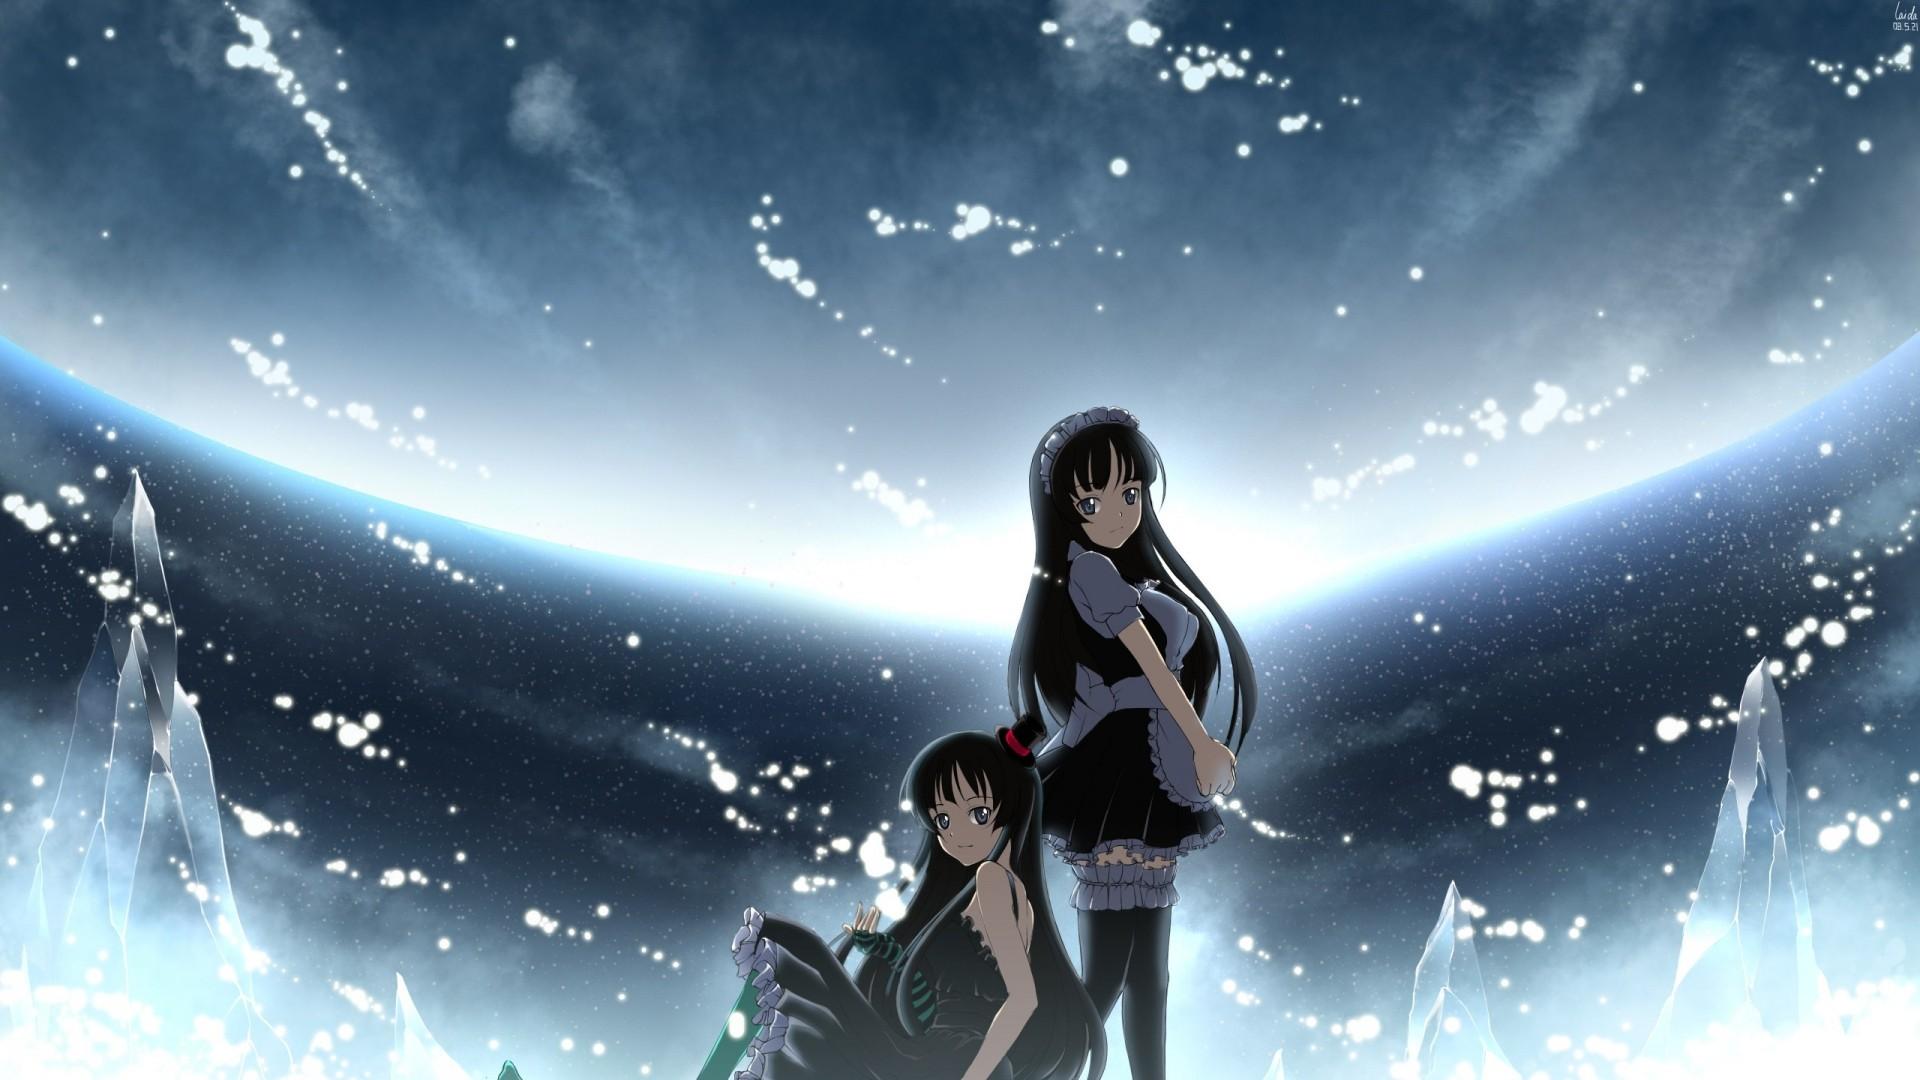 Anime Girls K ON Akiyama Mio Universe Midnight Screenshot 1920x1080 Px Computer Wallpaper Outer Space